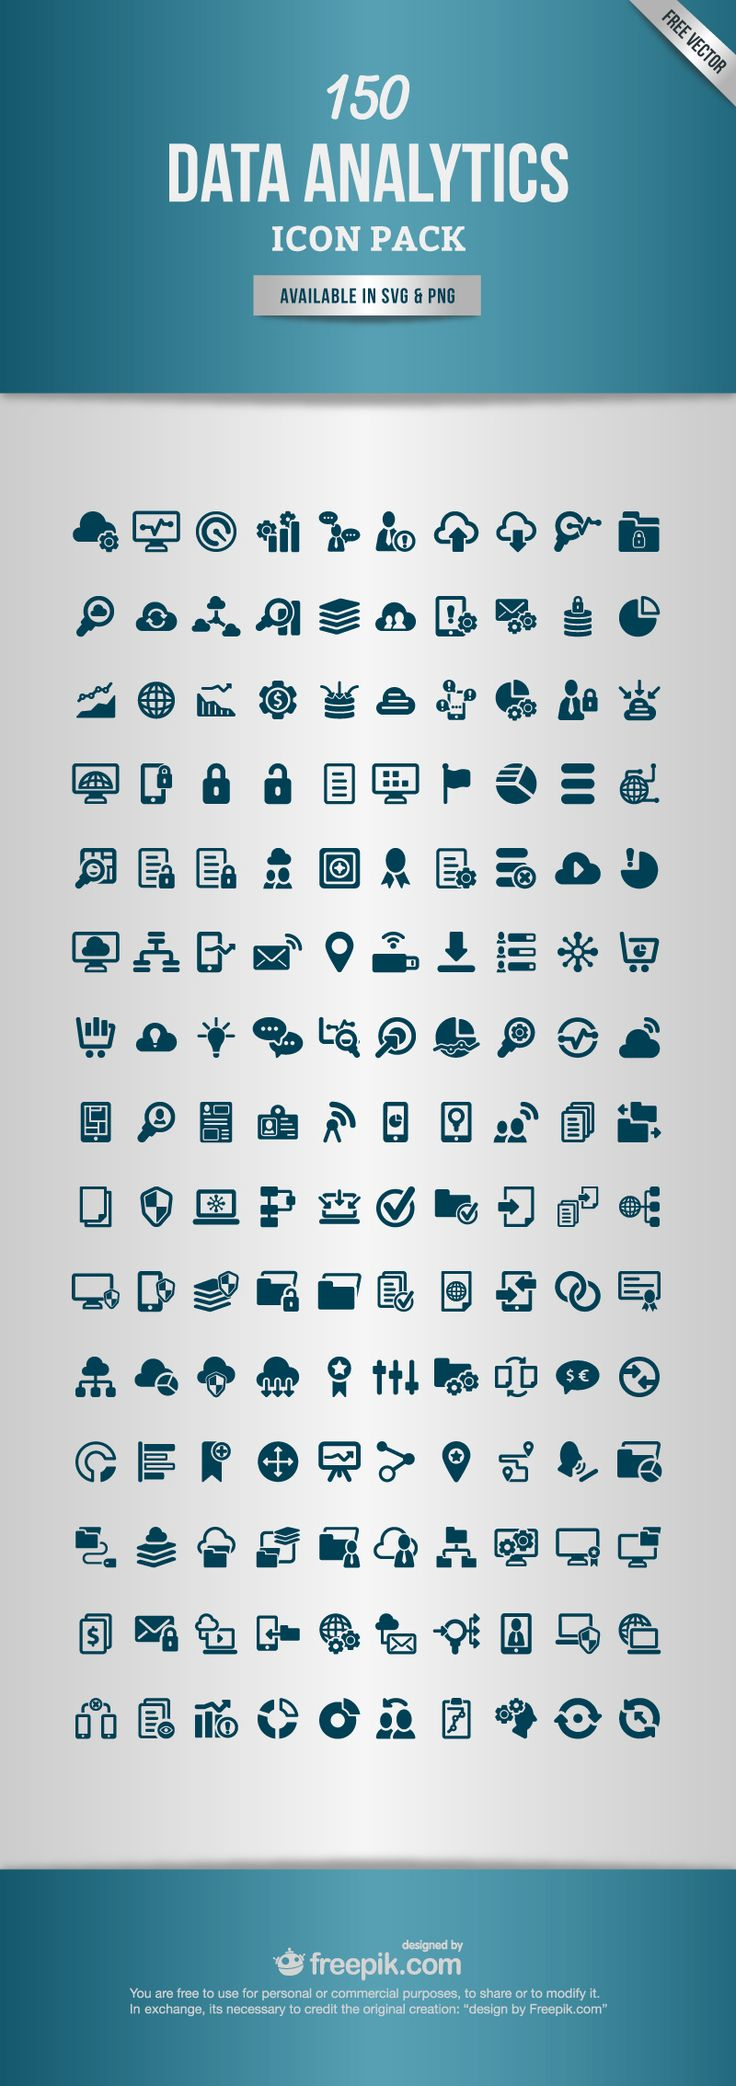 150 Free Data Analytics Icons, #Analytics, #Free, #Graphic #Design, #Icon, #PNG, #Resource, #SVG, #Vector